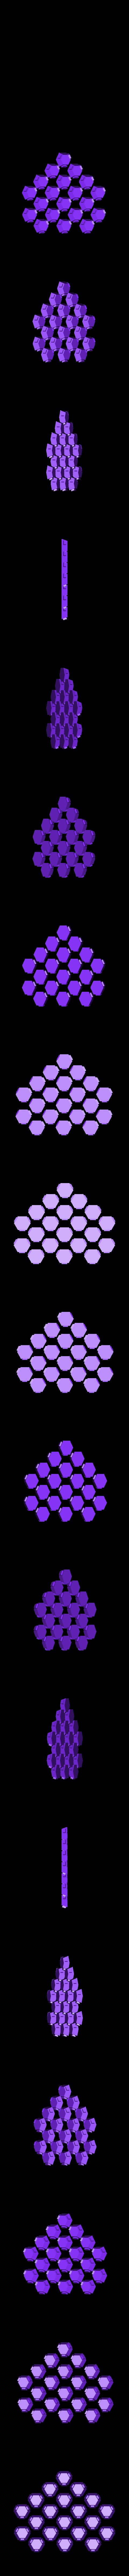 truncated_icosahedron_20_hexagons.stl Download free STL file Soccer ball (Truncated icosahedron) assembly • 3D printer object, mattias_selin